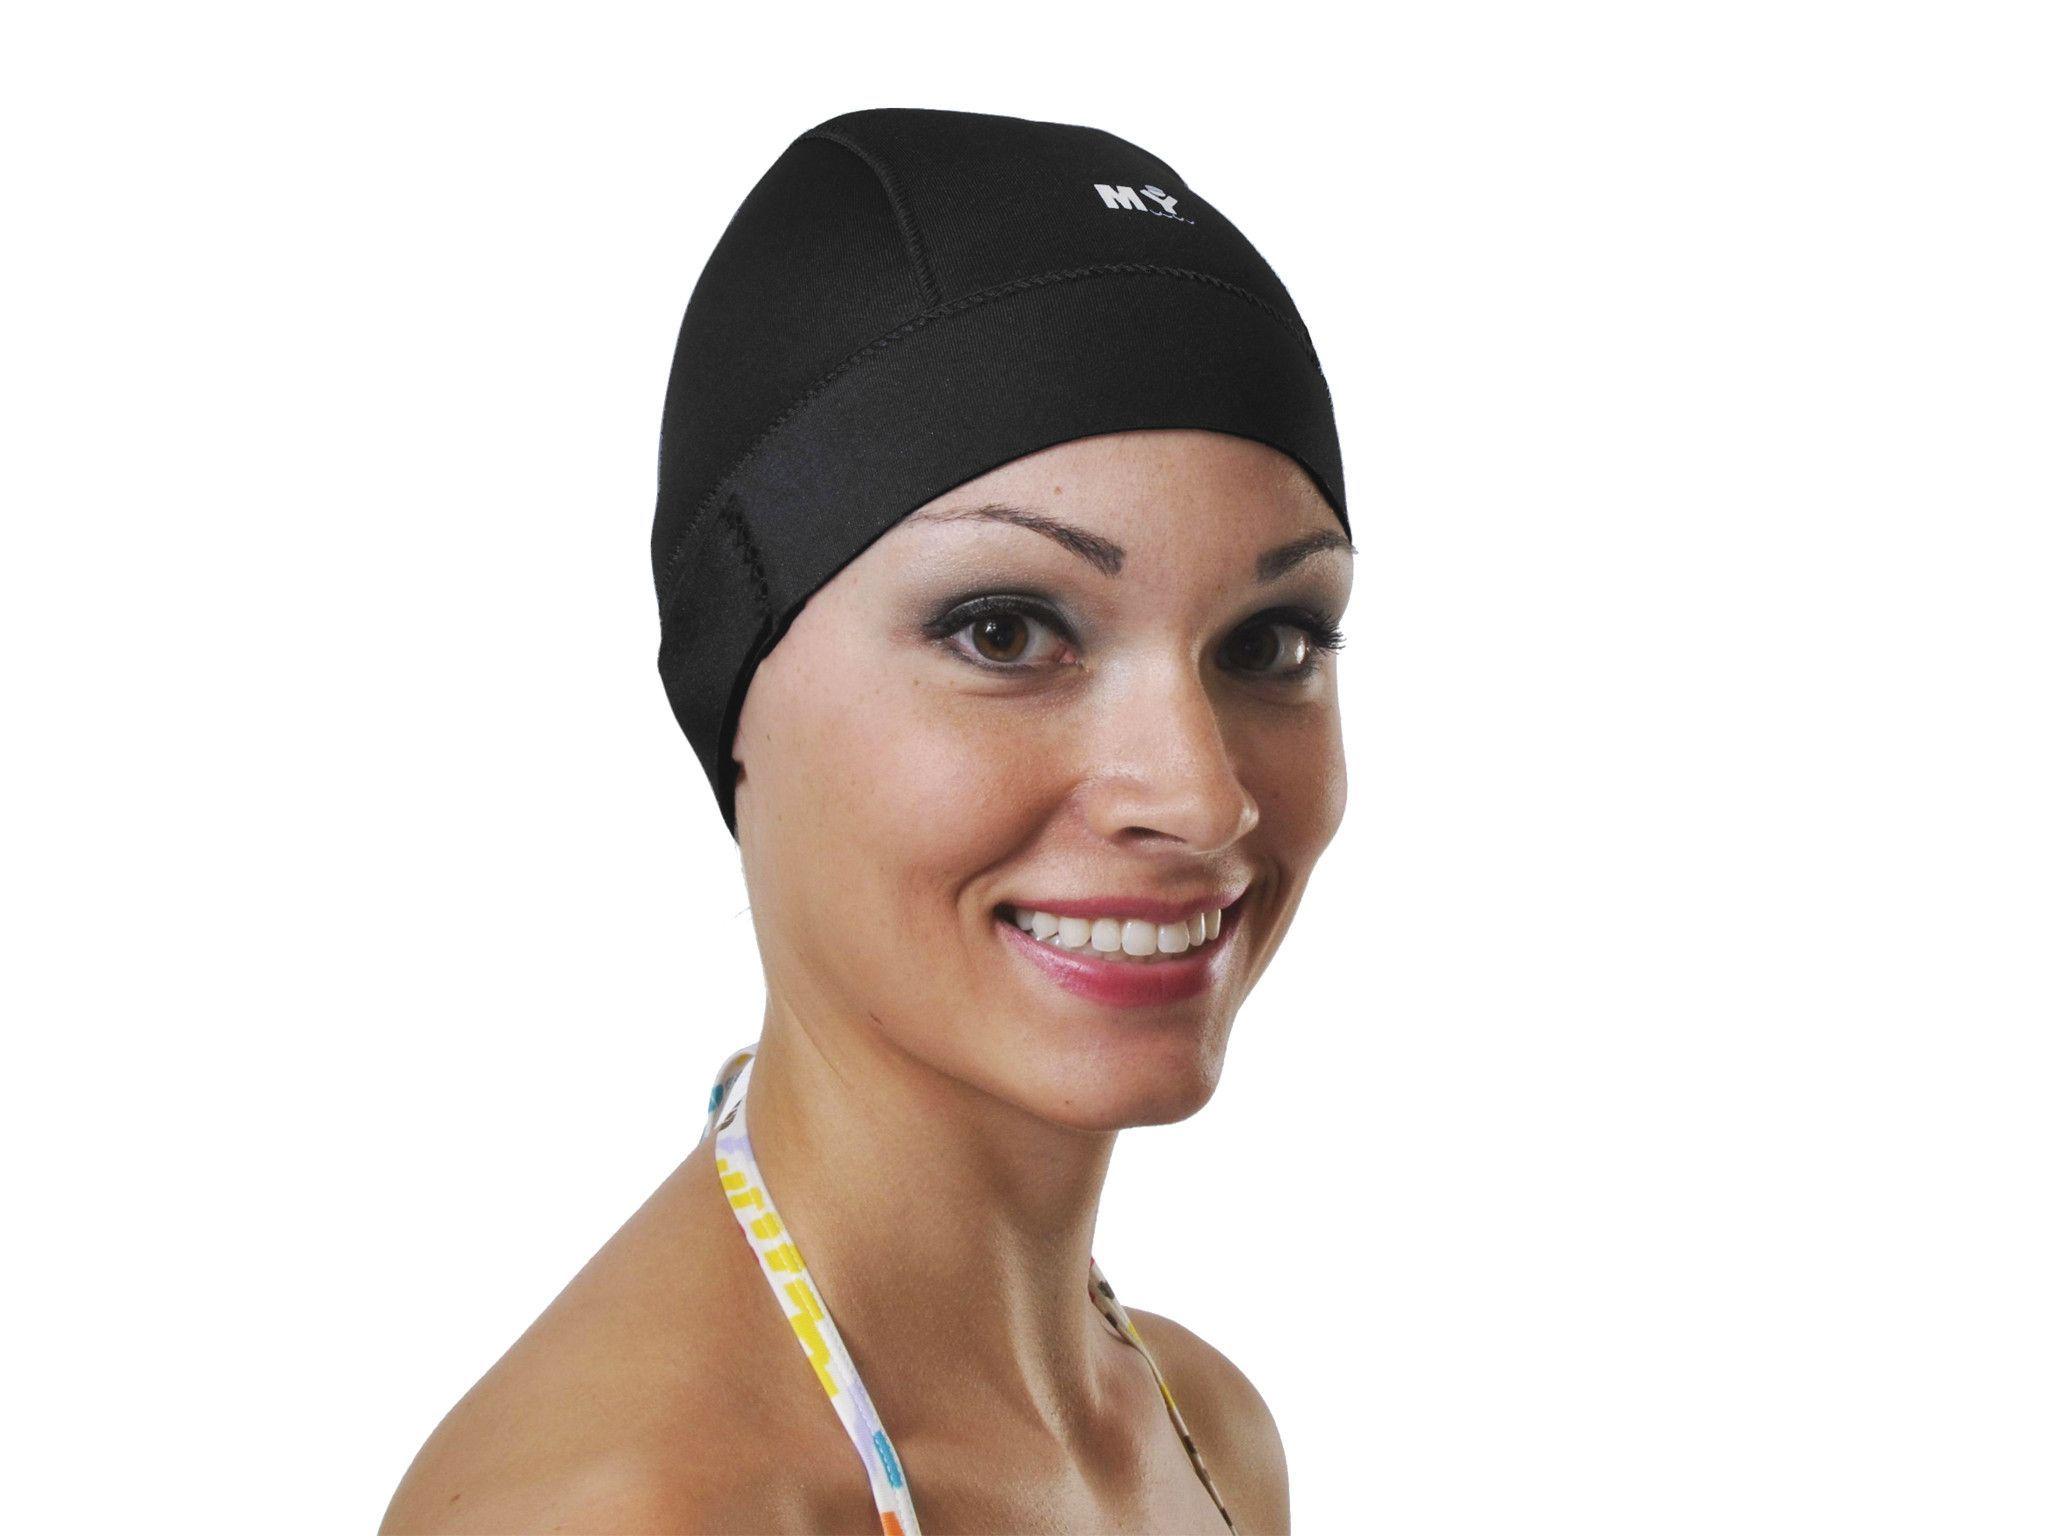 Best Swim Cap For Keeping Hair Dry Fits Long Hair Braids Extensions In 2019 Swim Caps Long Hair Styles Long Hair Tips